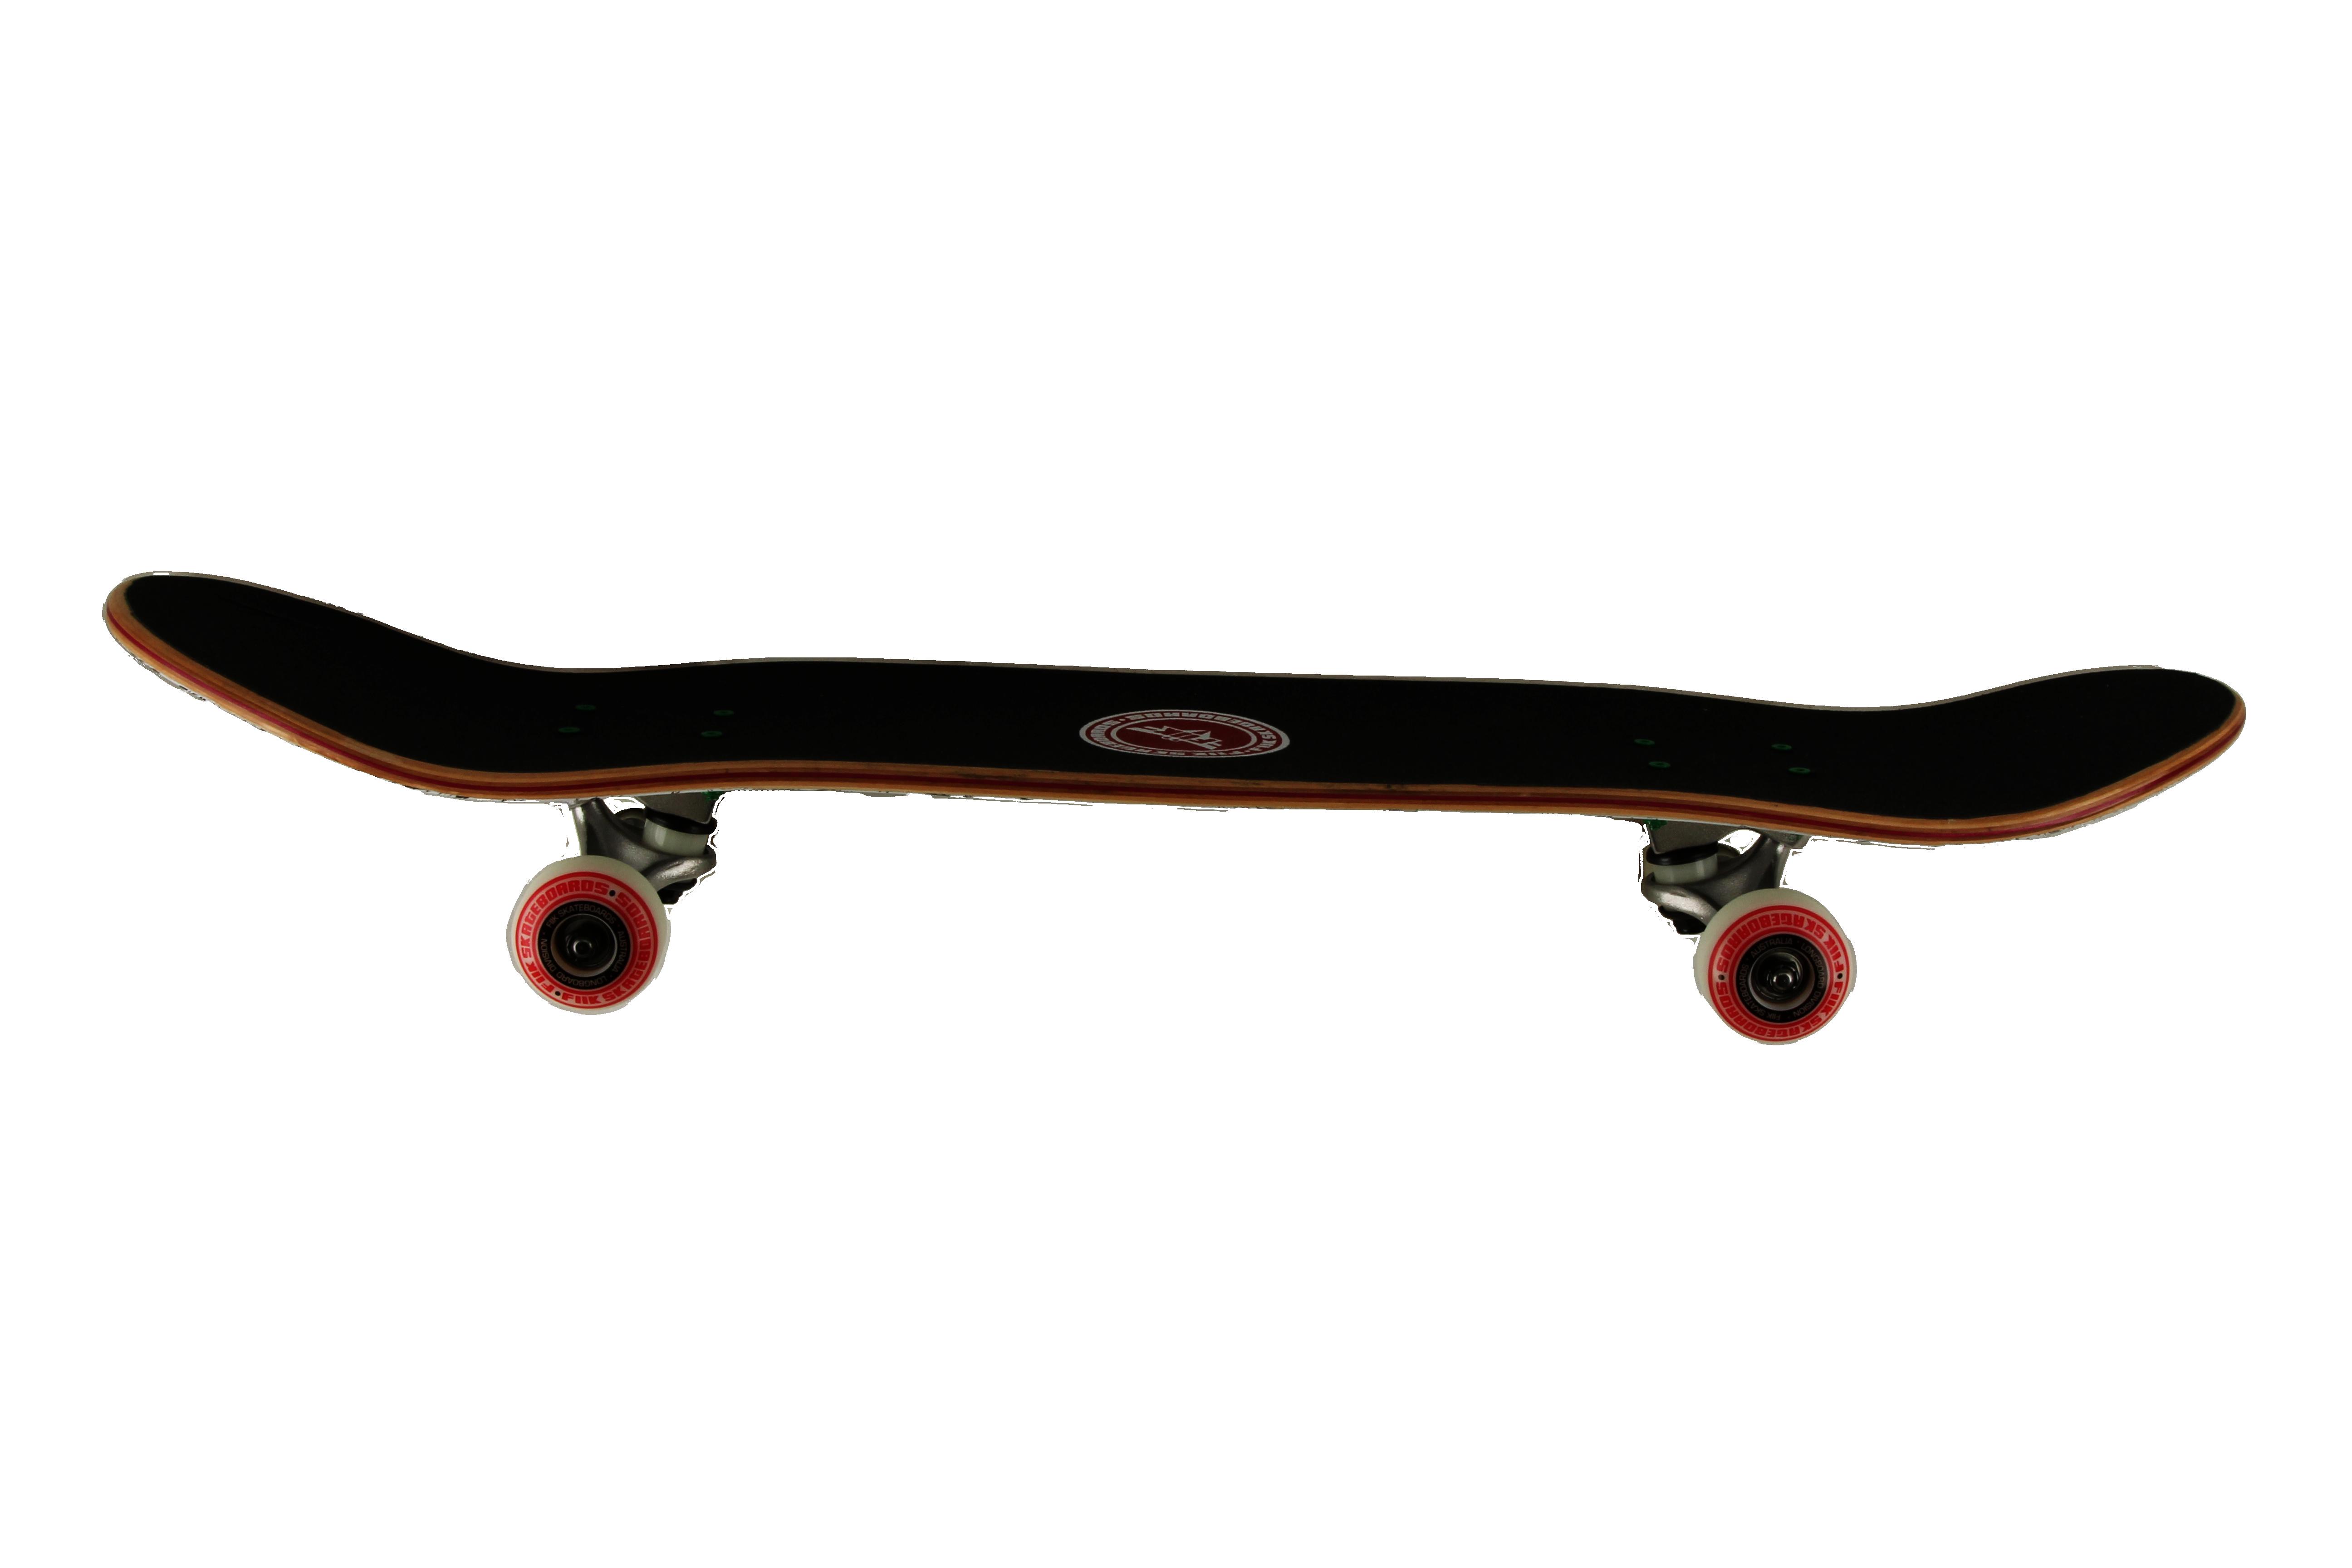 Skateboard HD PNG-PlusPNG.com-5184 - Skateboard HD PNG